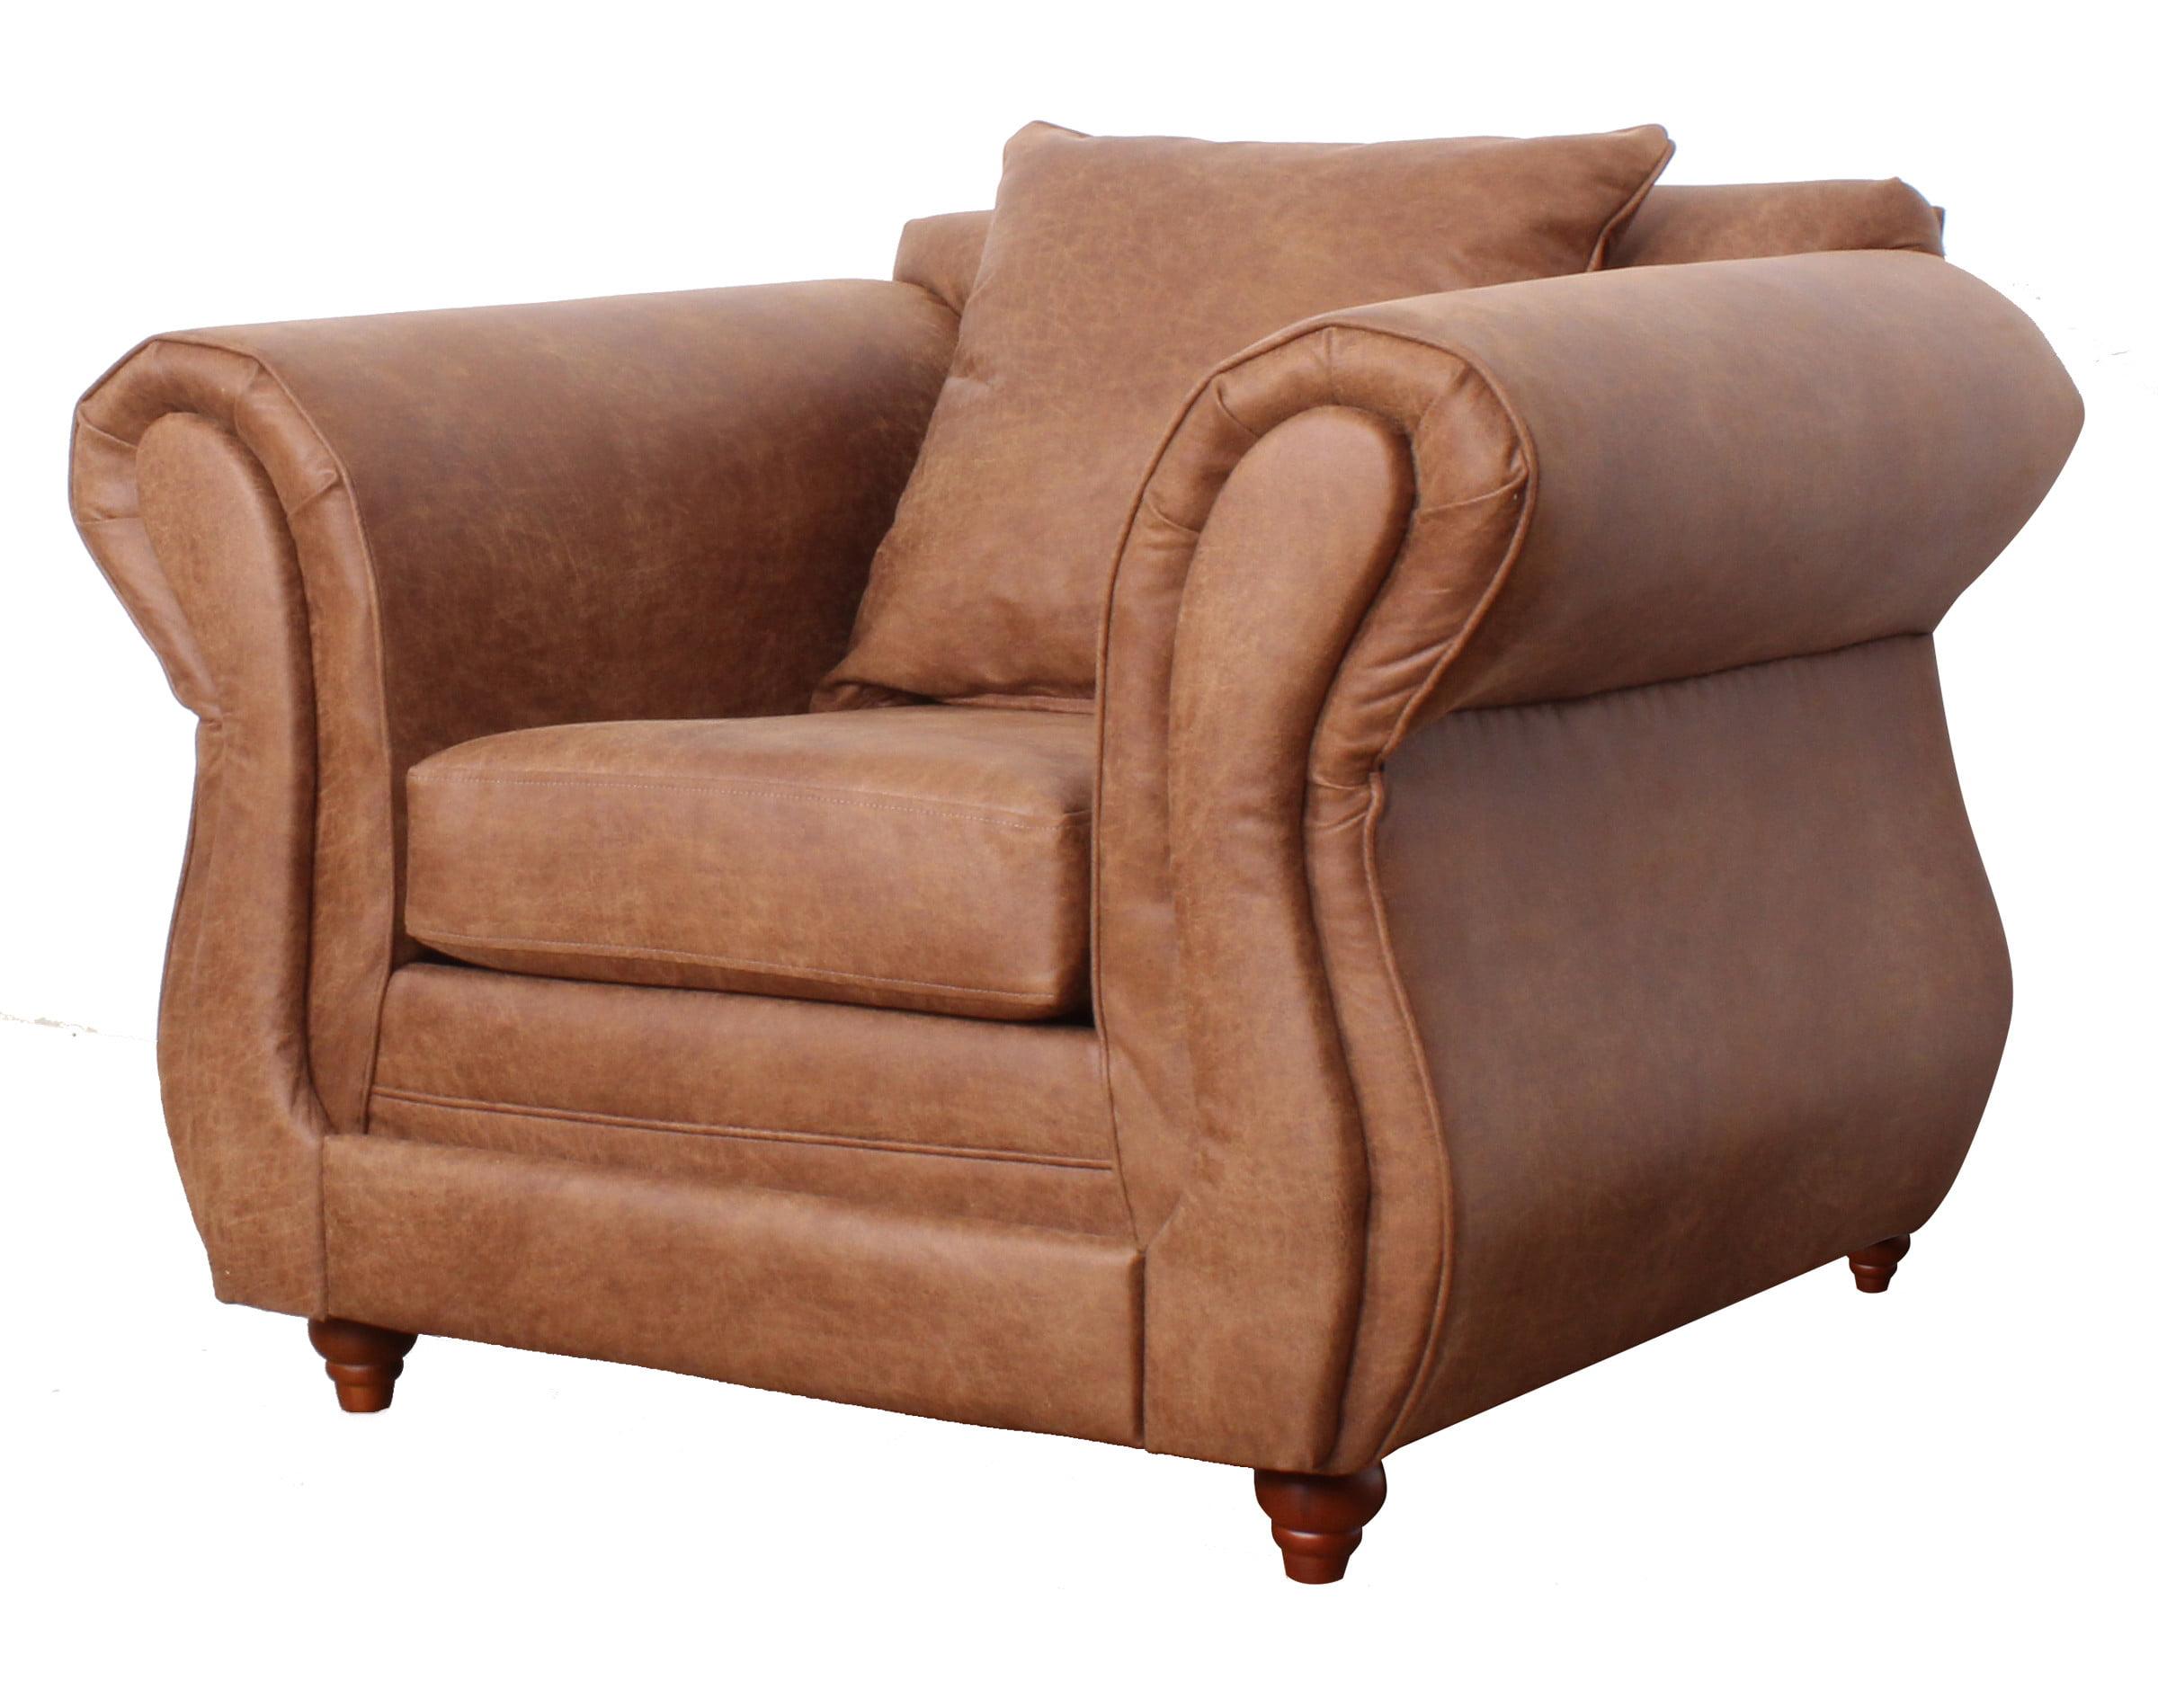 Sofa Lisboa Cuero Bonded 1c2